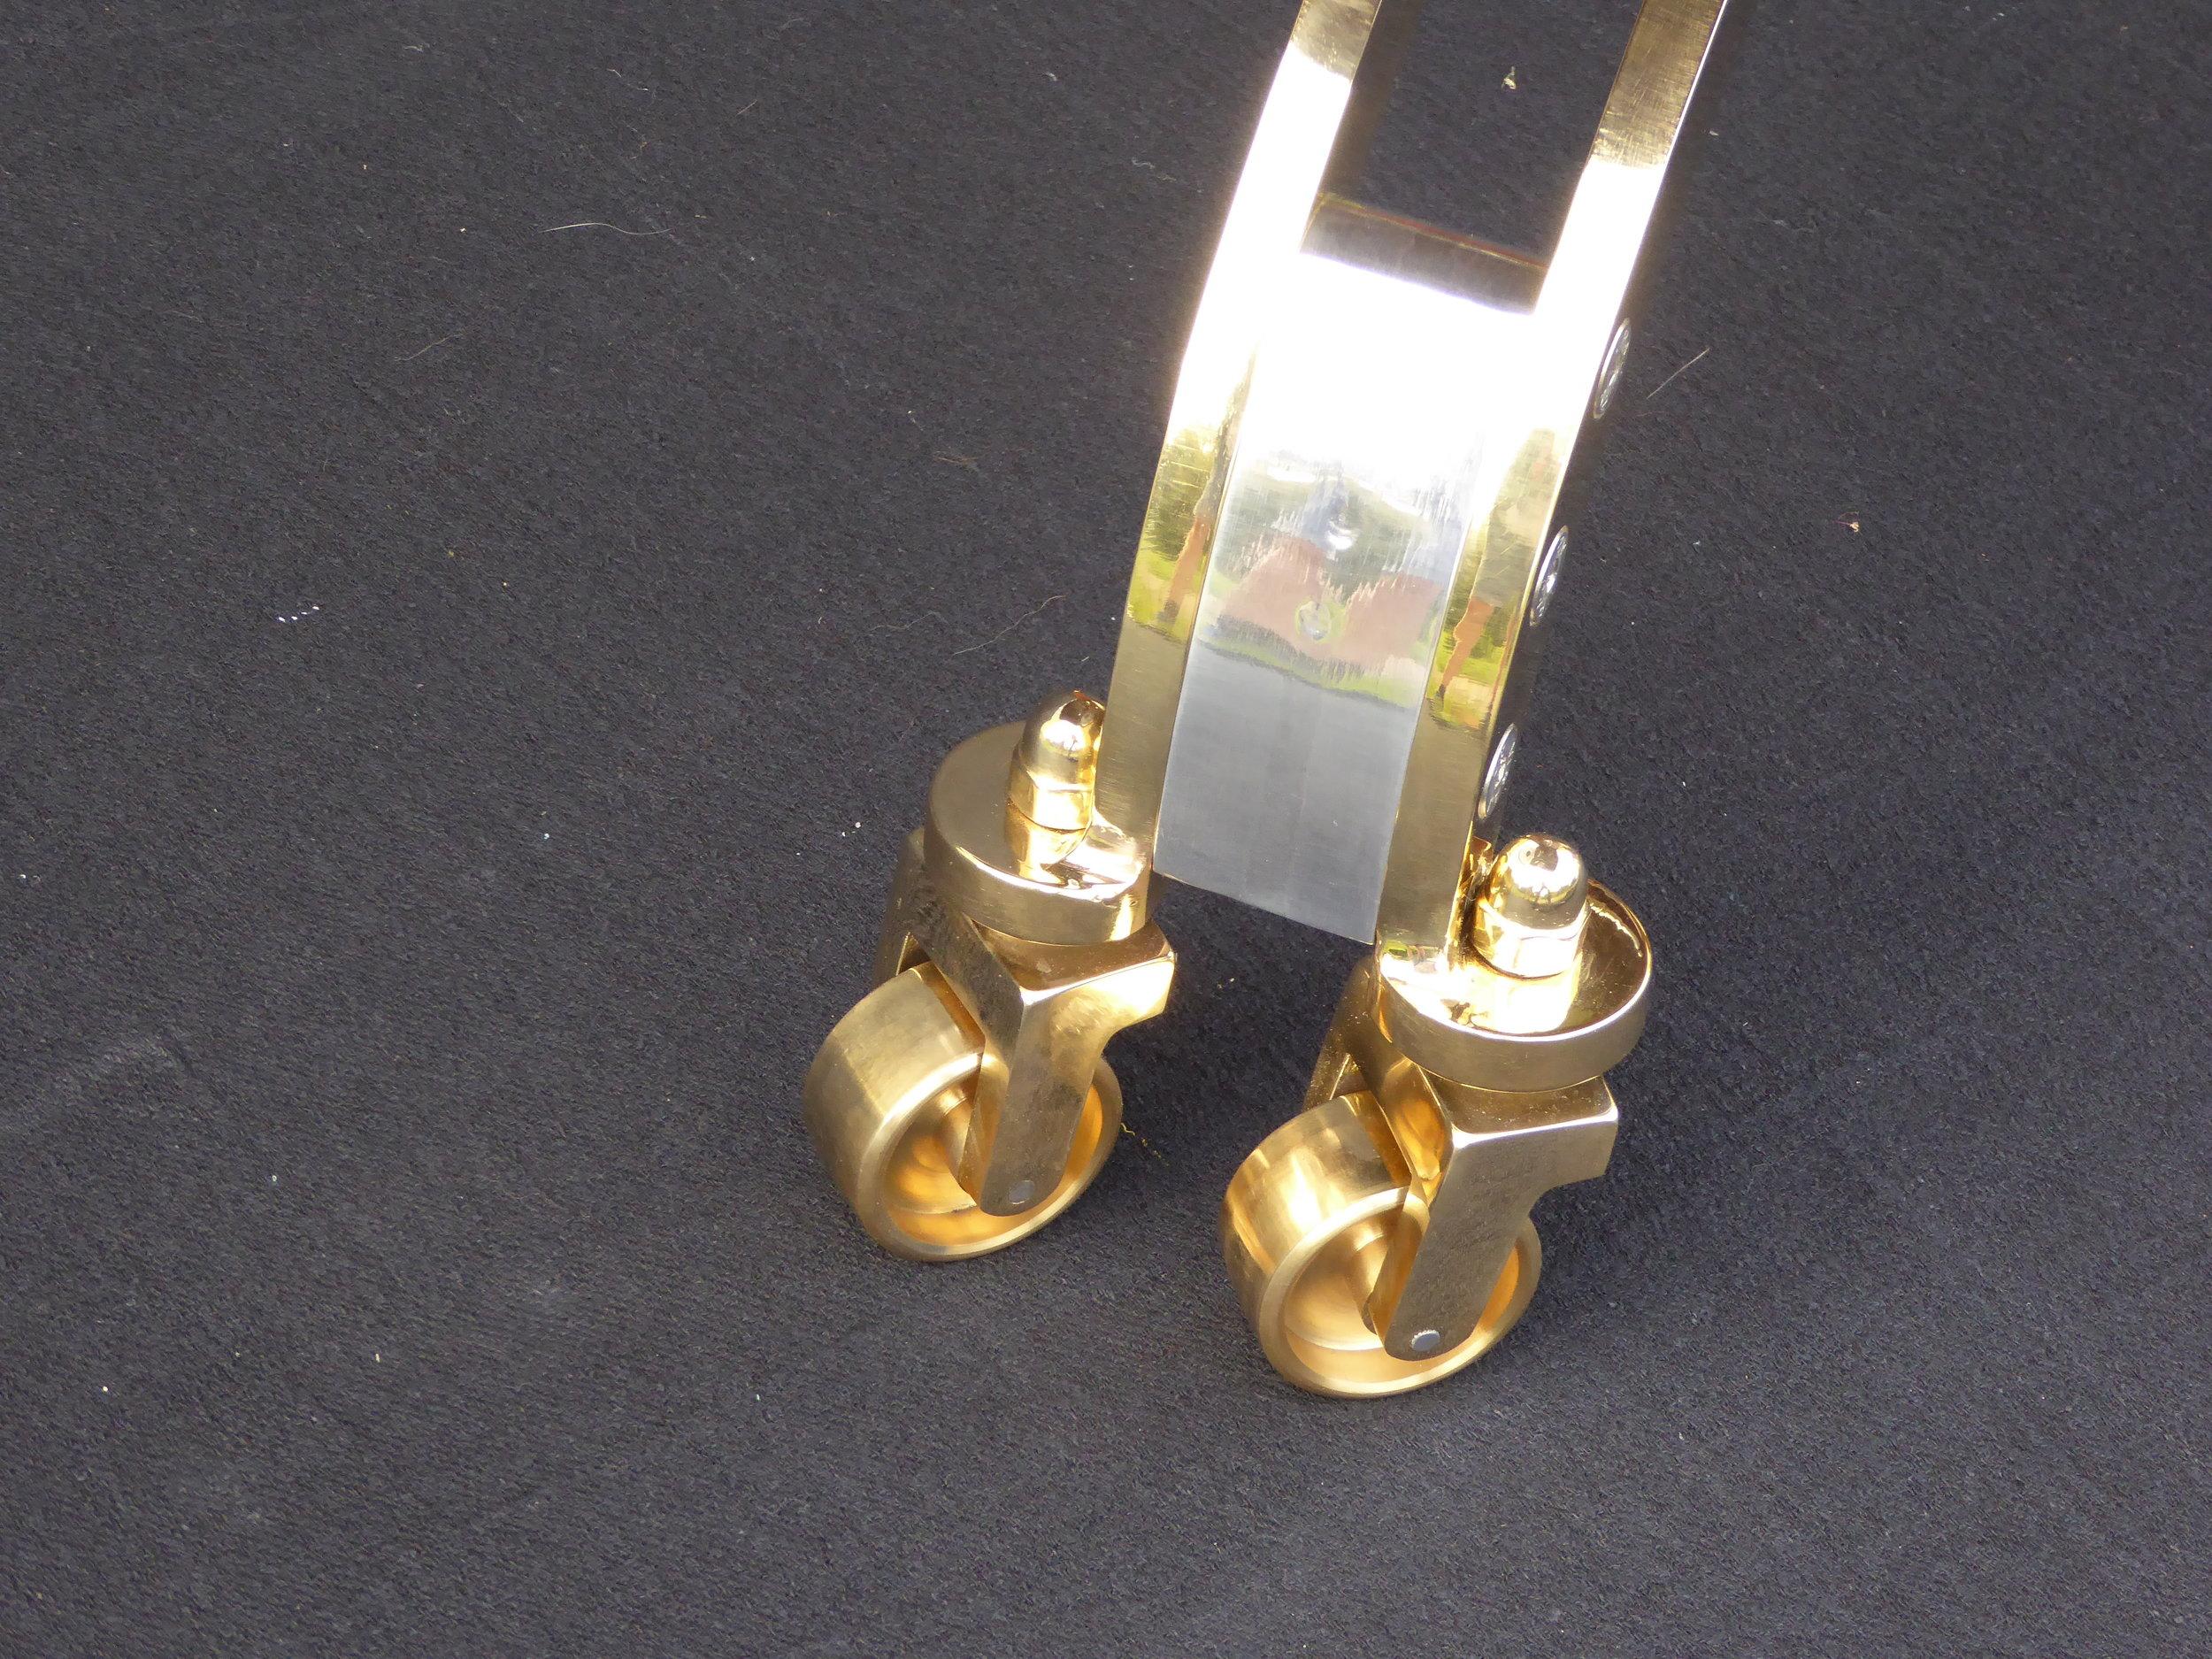 Riunióne desk chair wheel detail in brass